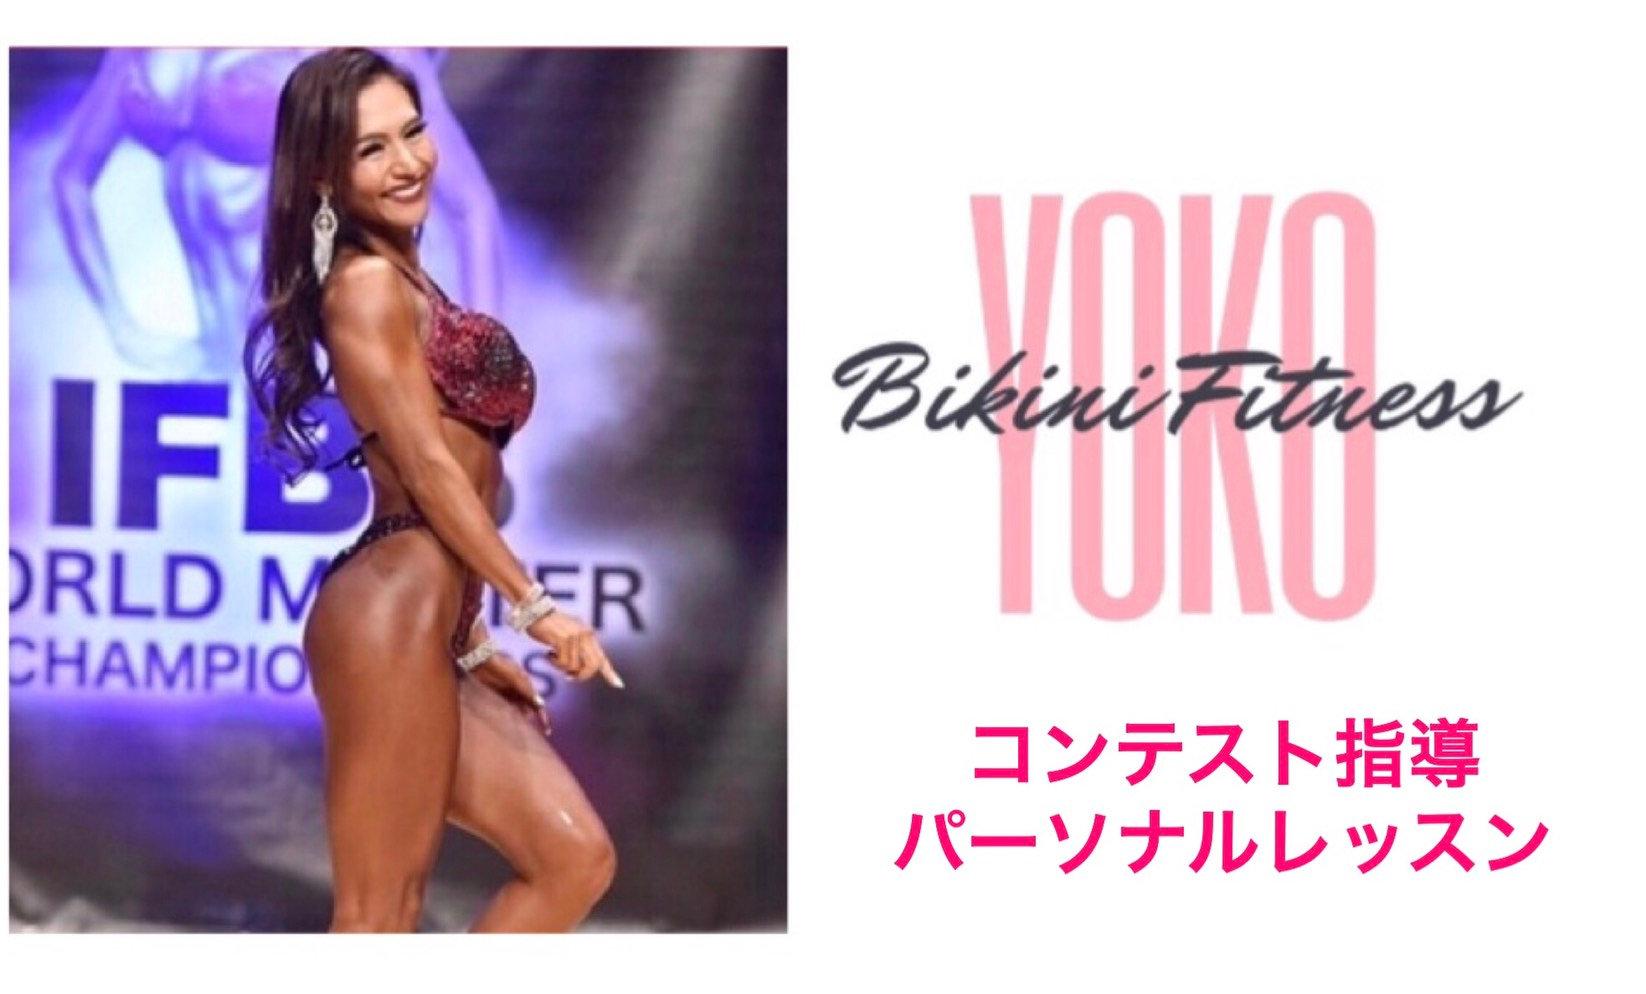 Yokoパーソナル